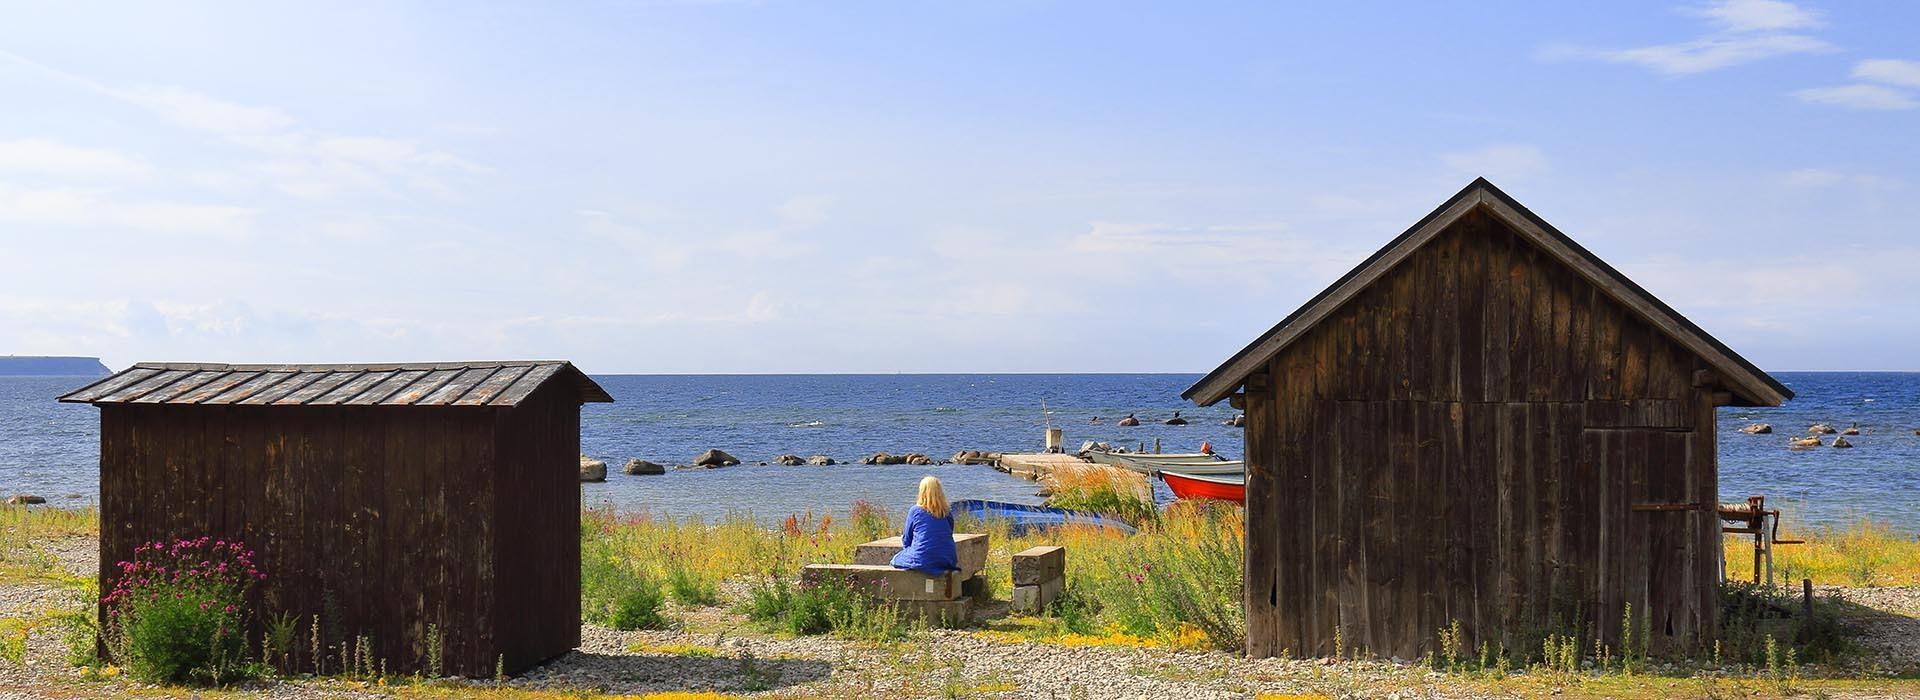 Gotland_urval_2019_04